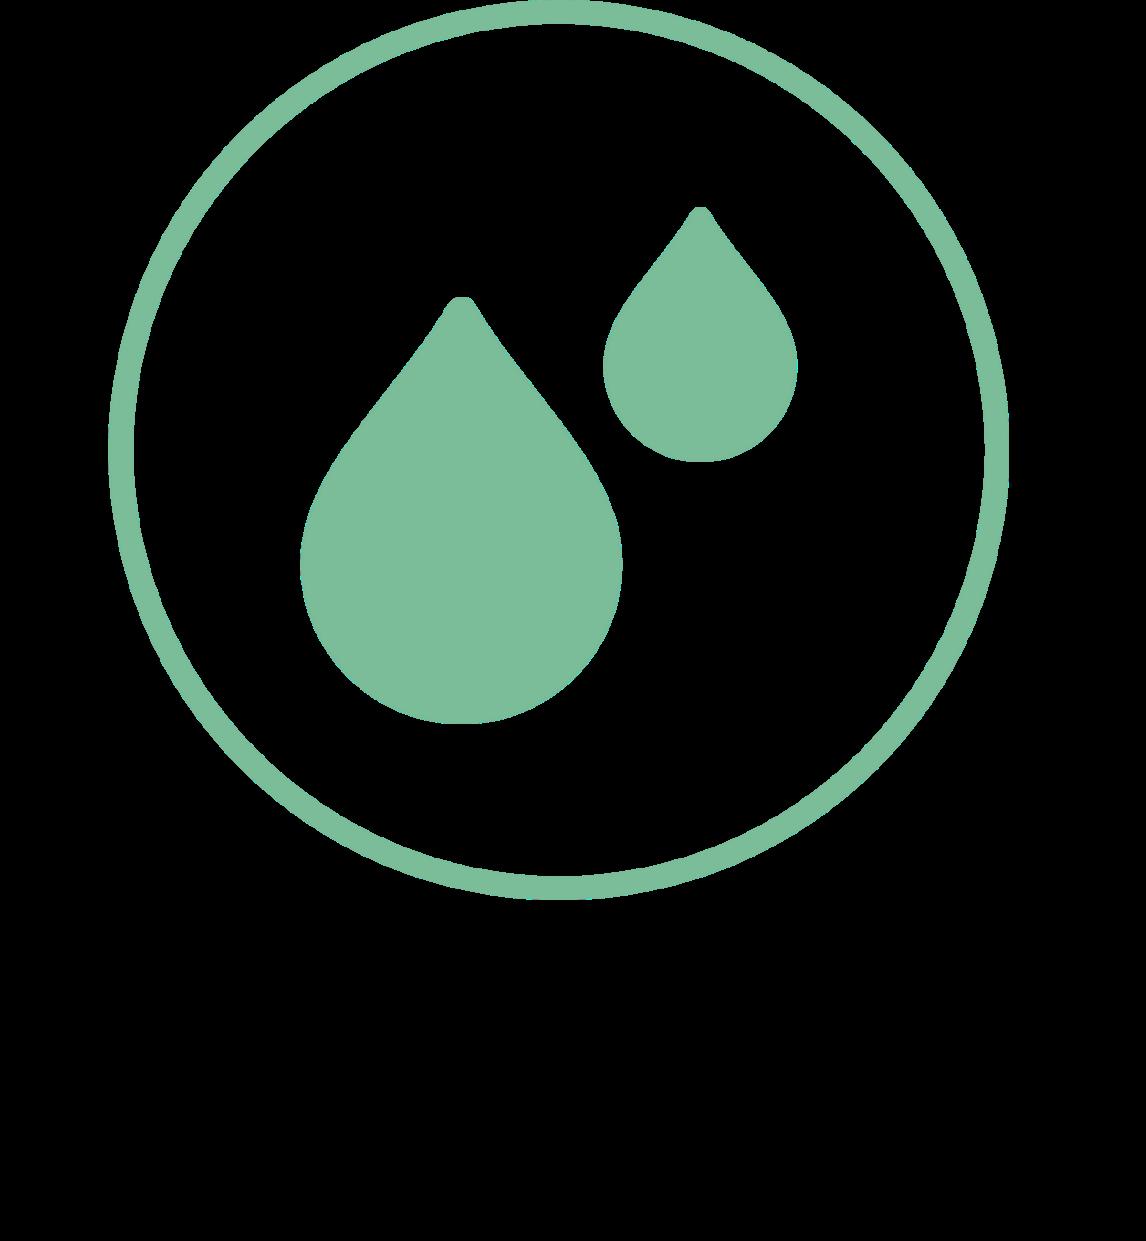 AwardGraphic_Water_Green.png